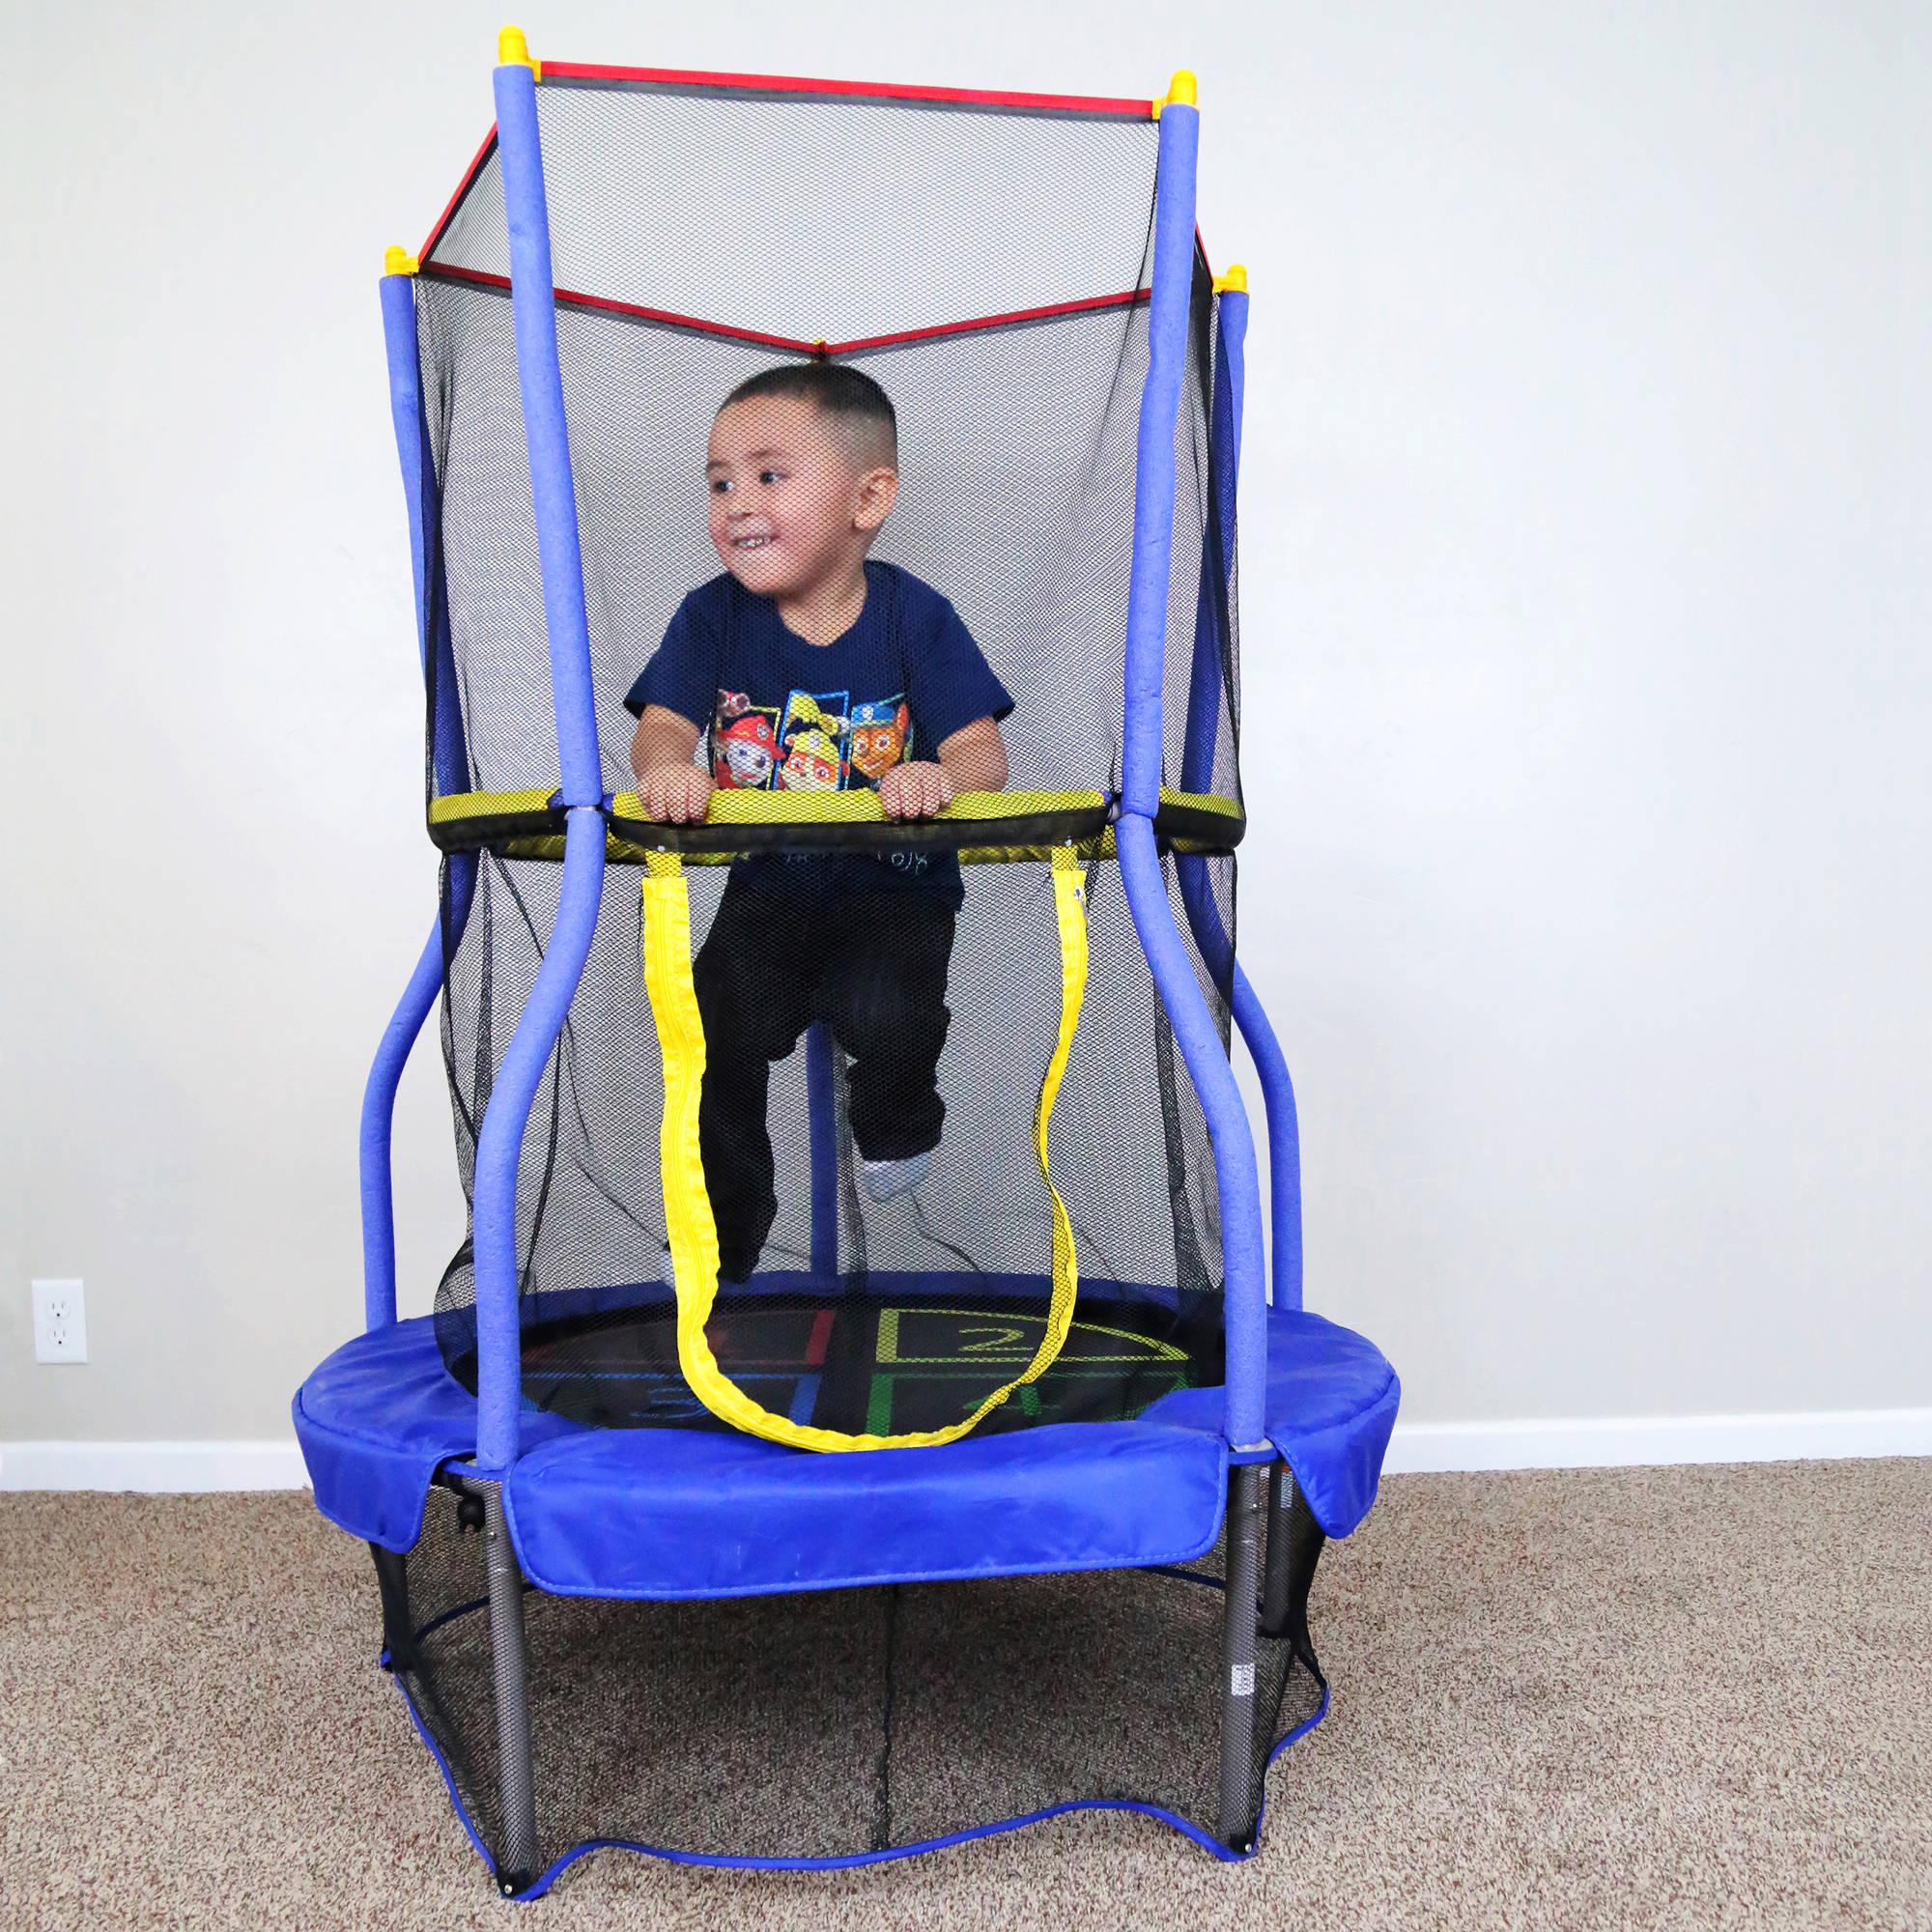 "Skywalker Bounce-N-Learn 40"" Trampoline with Enclosure $29 at Walmart"